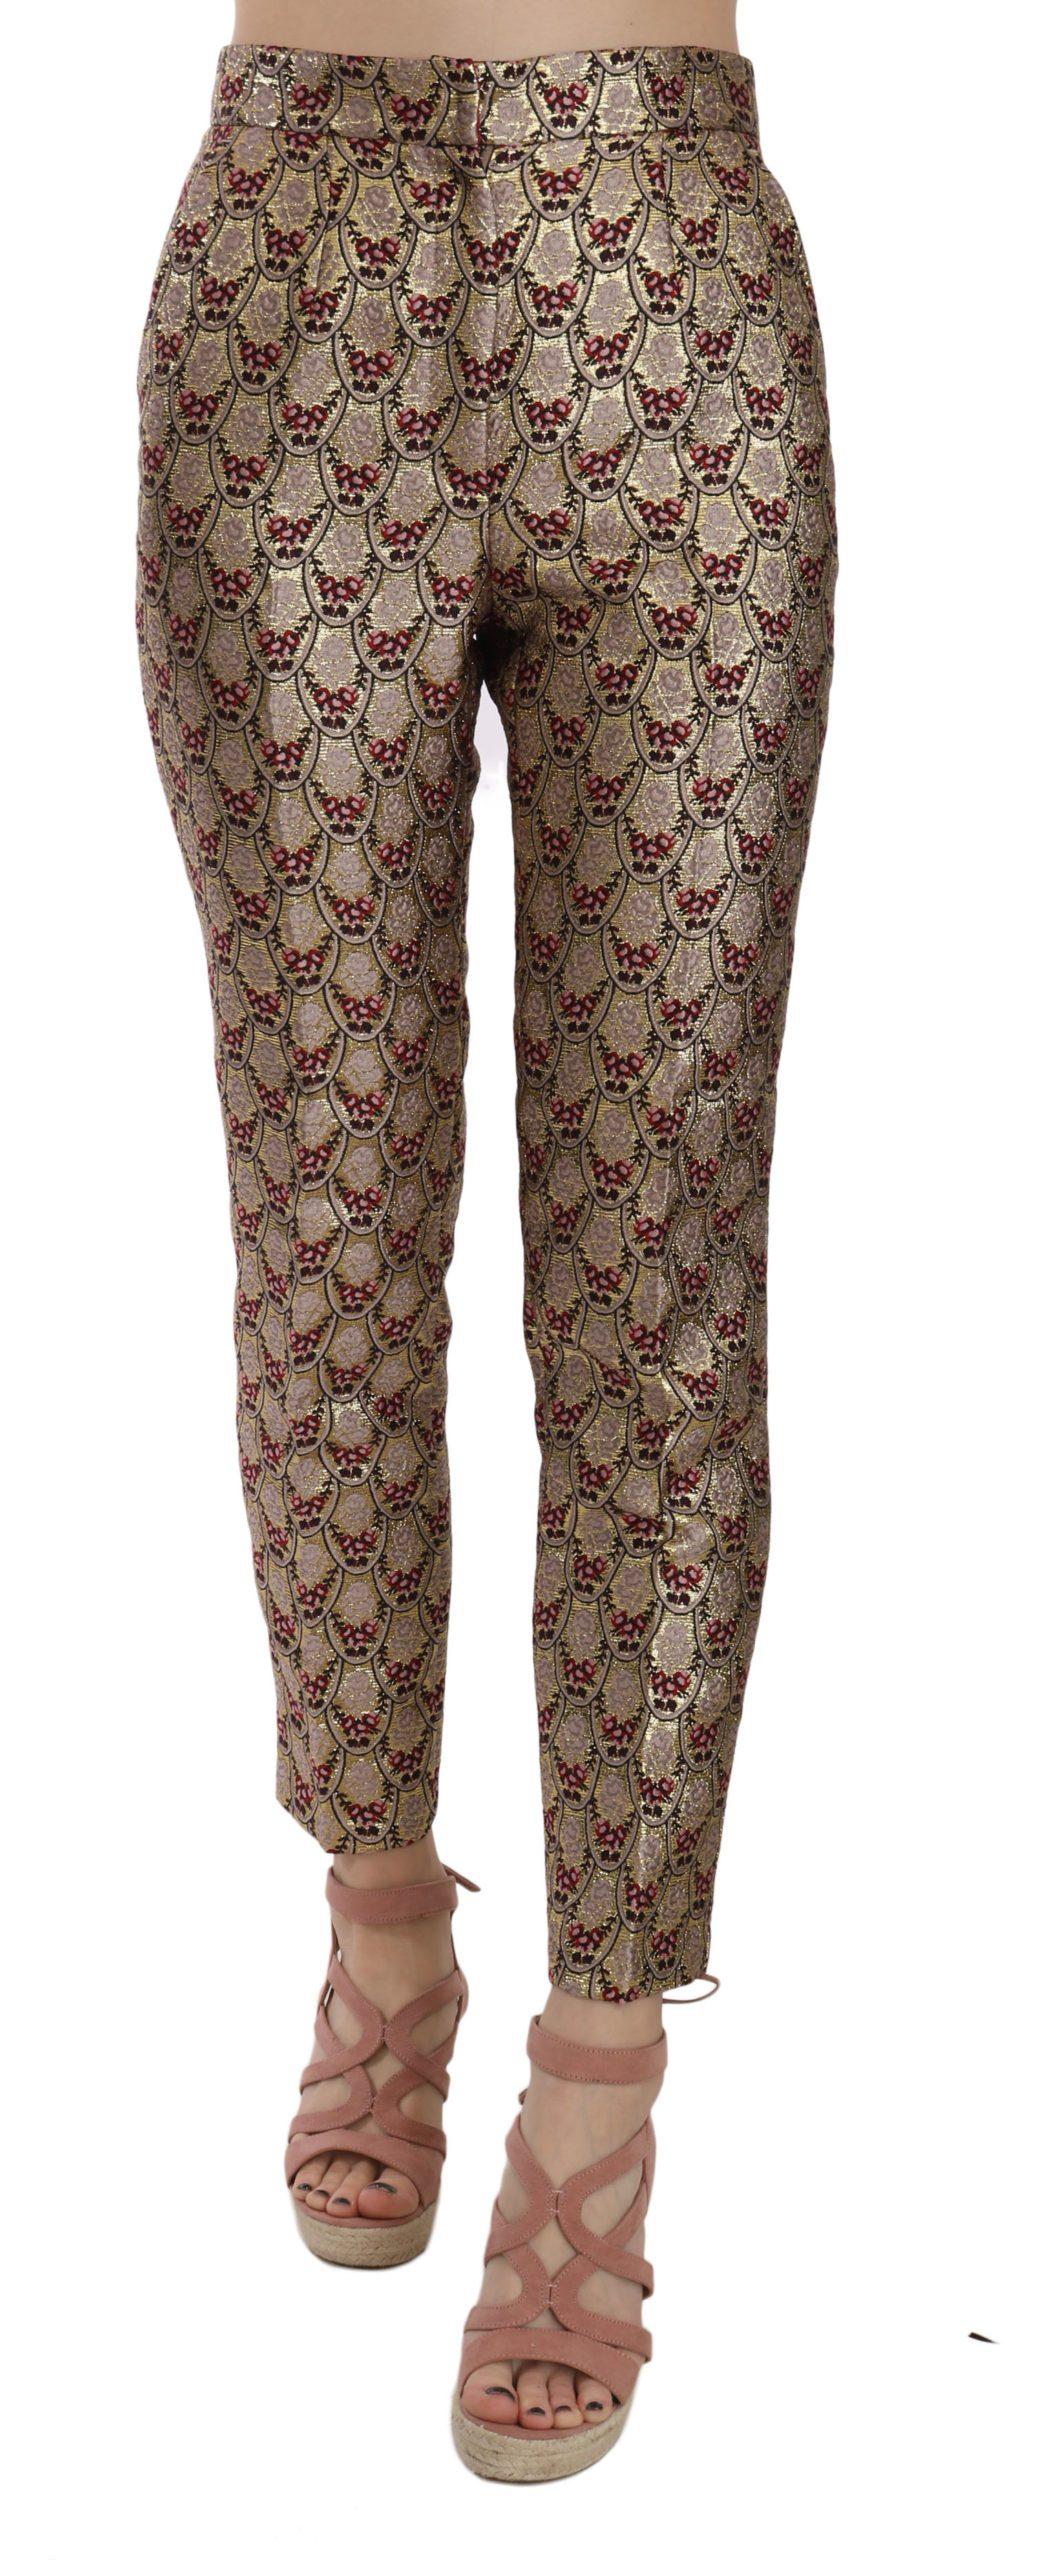 Dolce & Gabbana Women's Jacquard Metallic Tapered Trouser Gold PAN70031 - IT38|XS